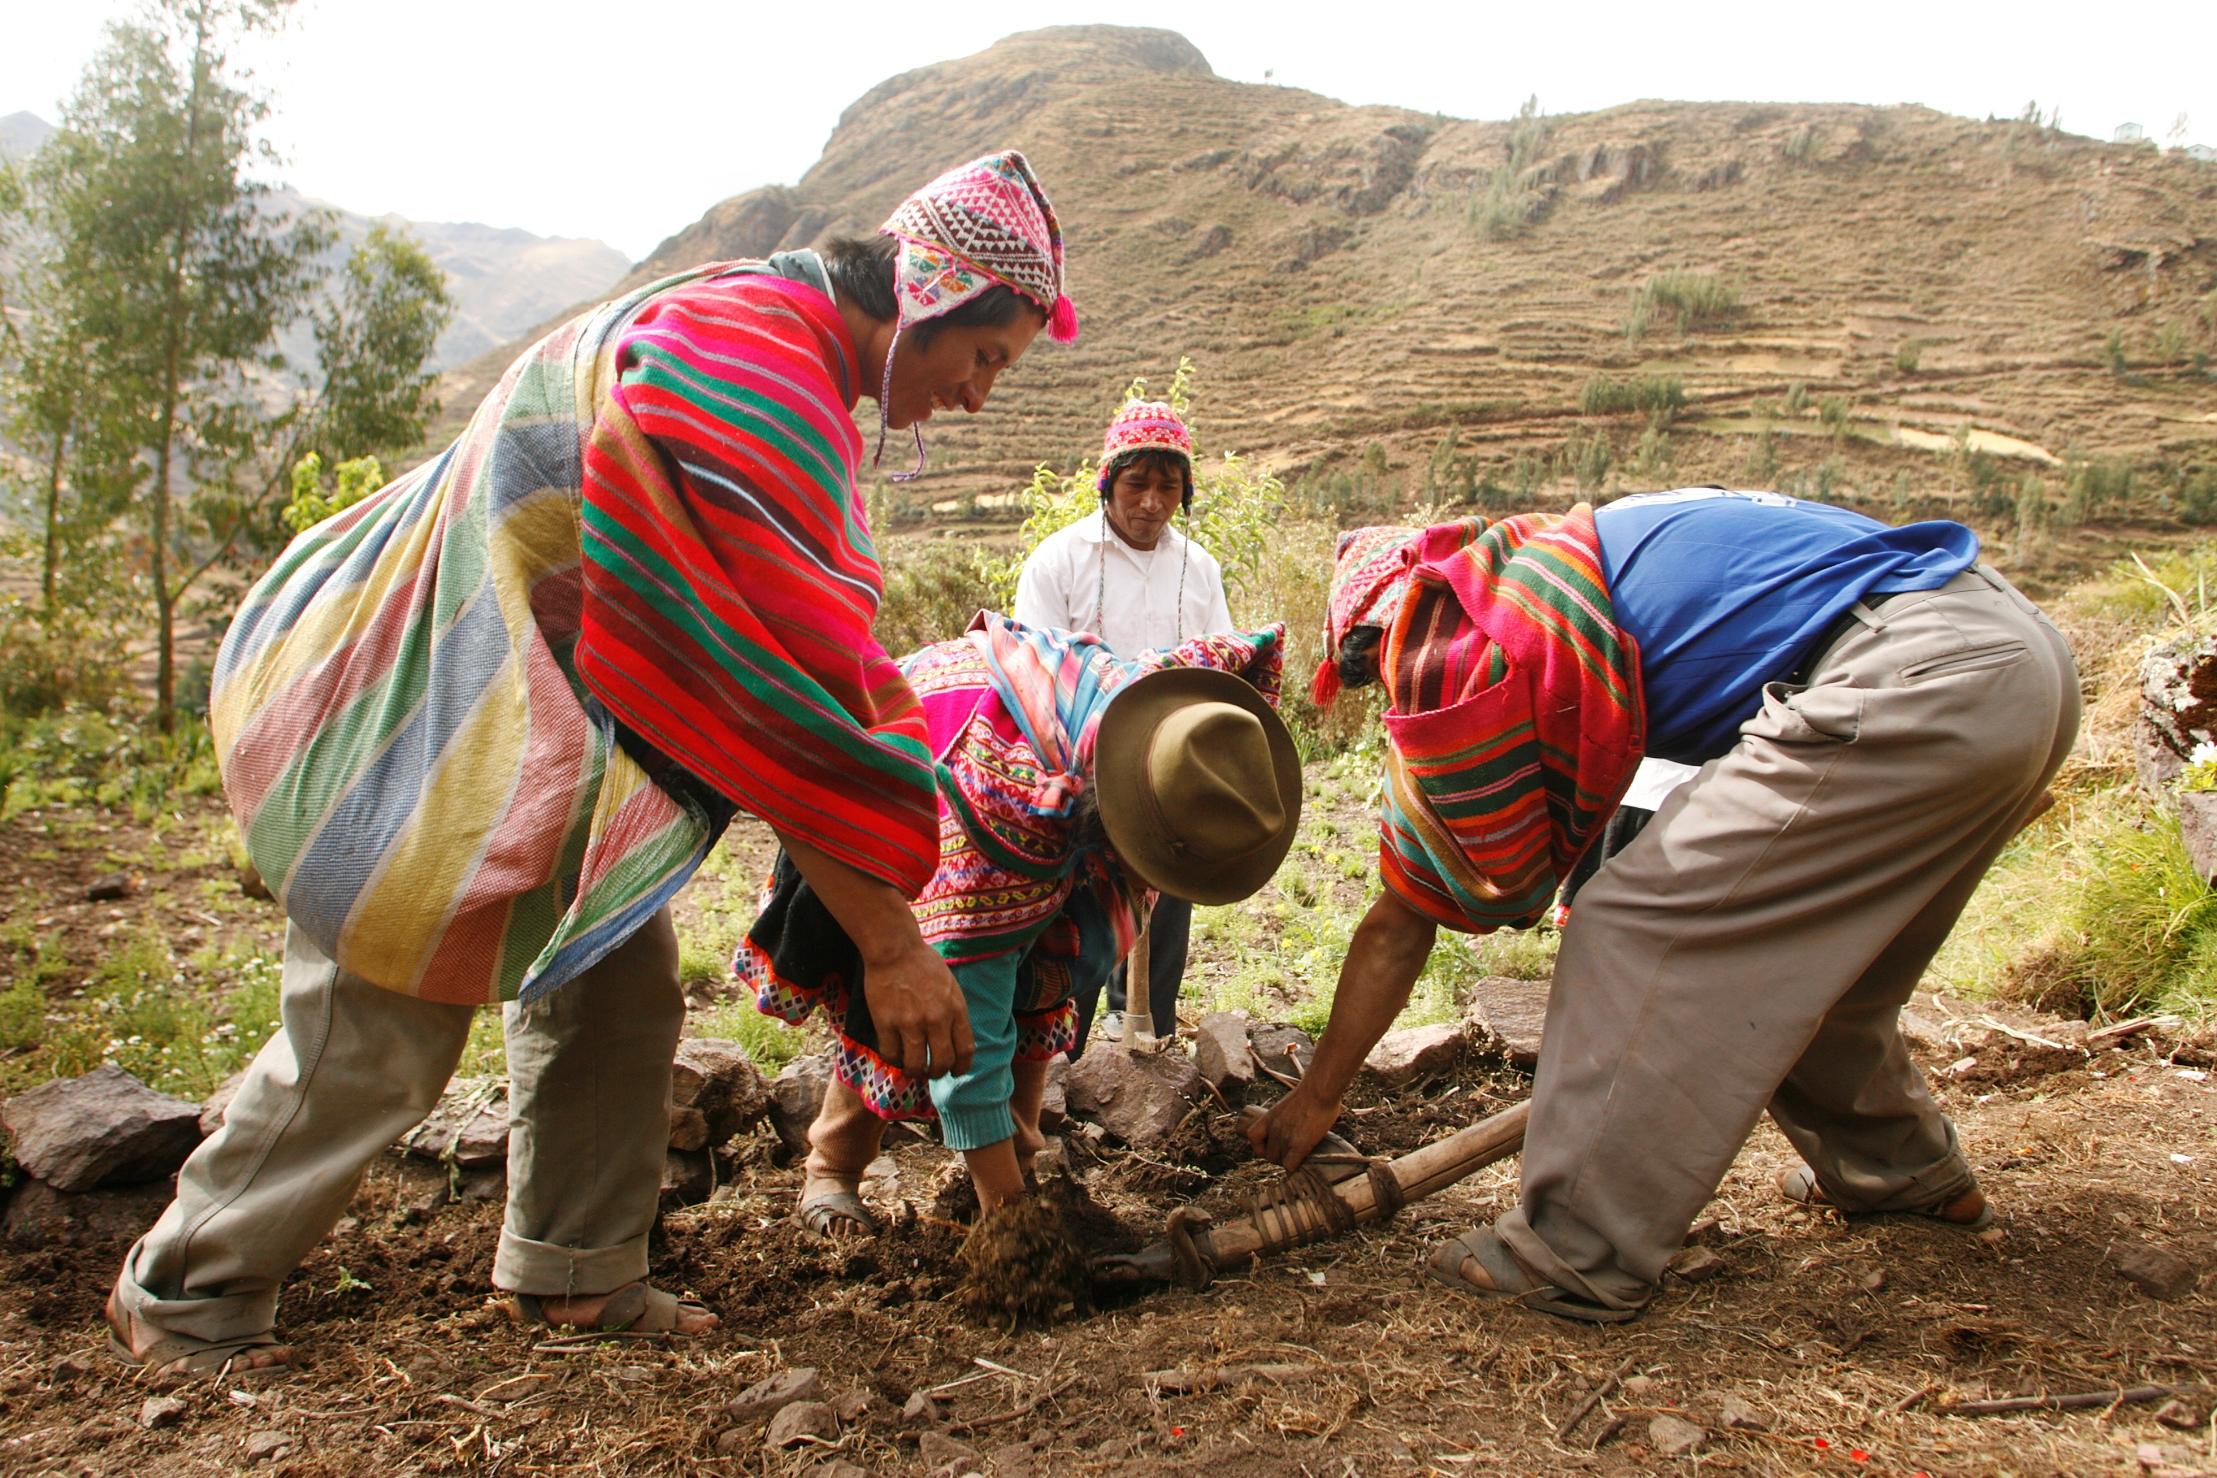 Smallholder farmers Peru ©Enrique Castro-Mendívil / PromPerú